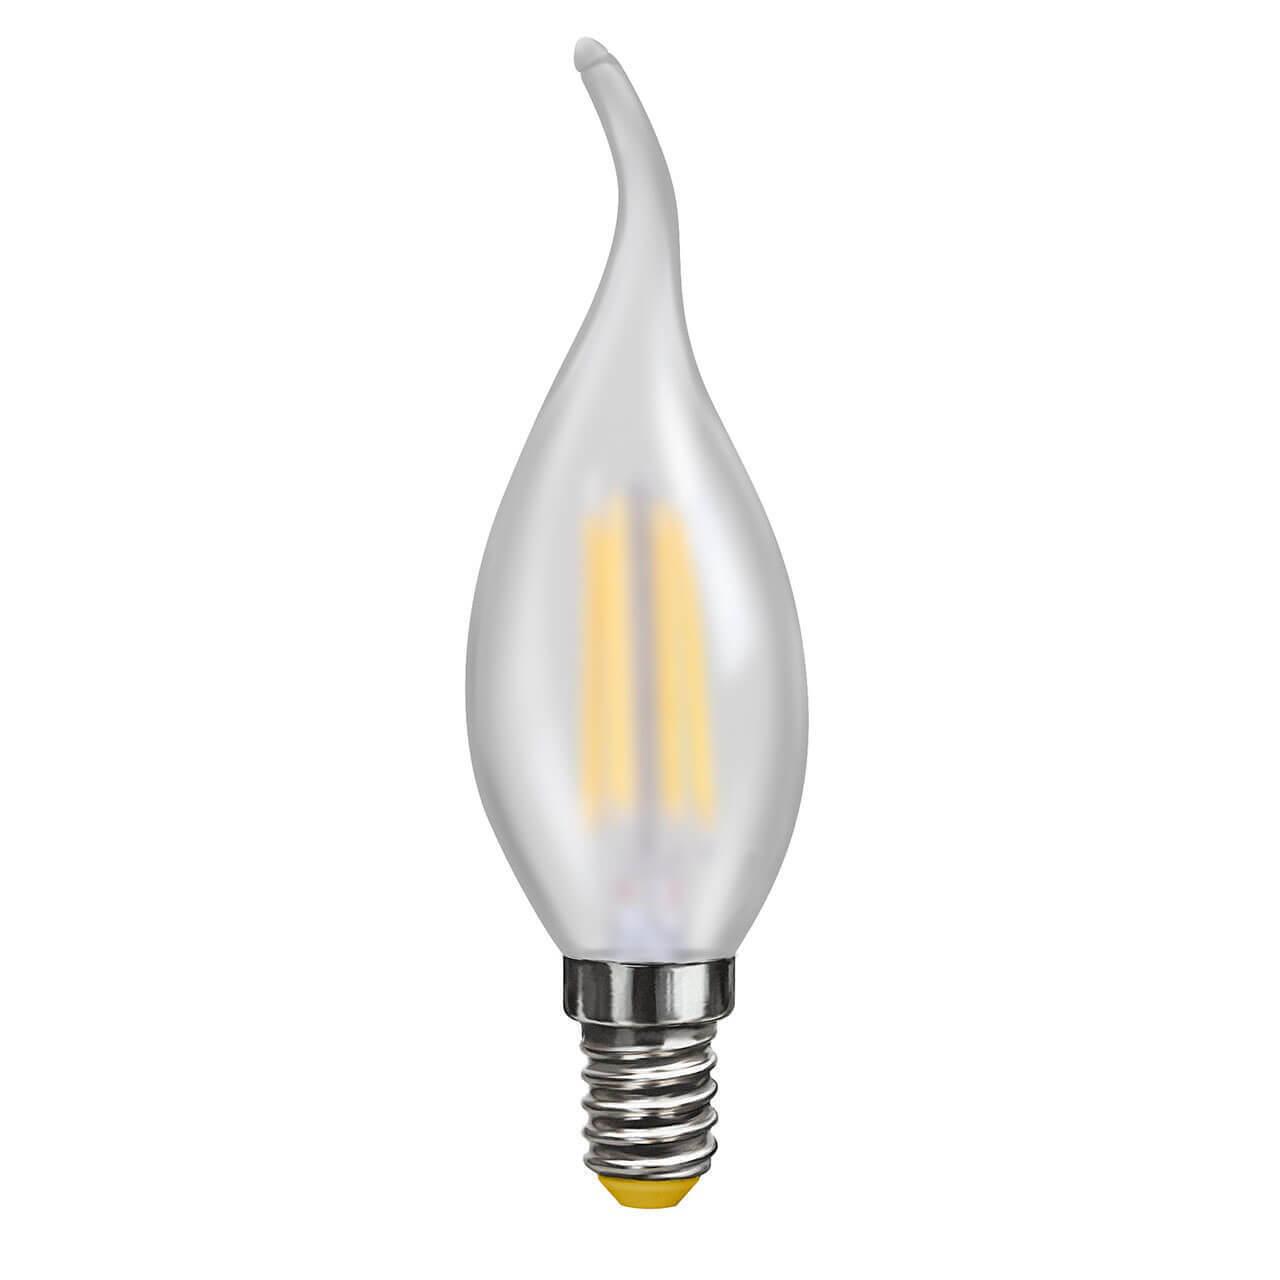 Лампа светодиодная филаментная Voltega E14 4W 4000К матовая VG10-CW2E14cold4W-F 7007 ретро лампа 5928 voltega